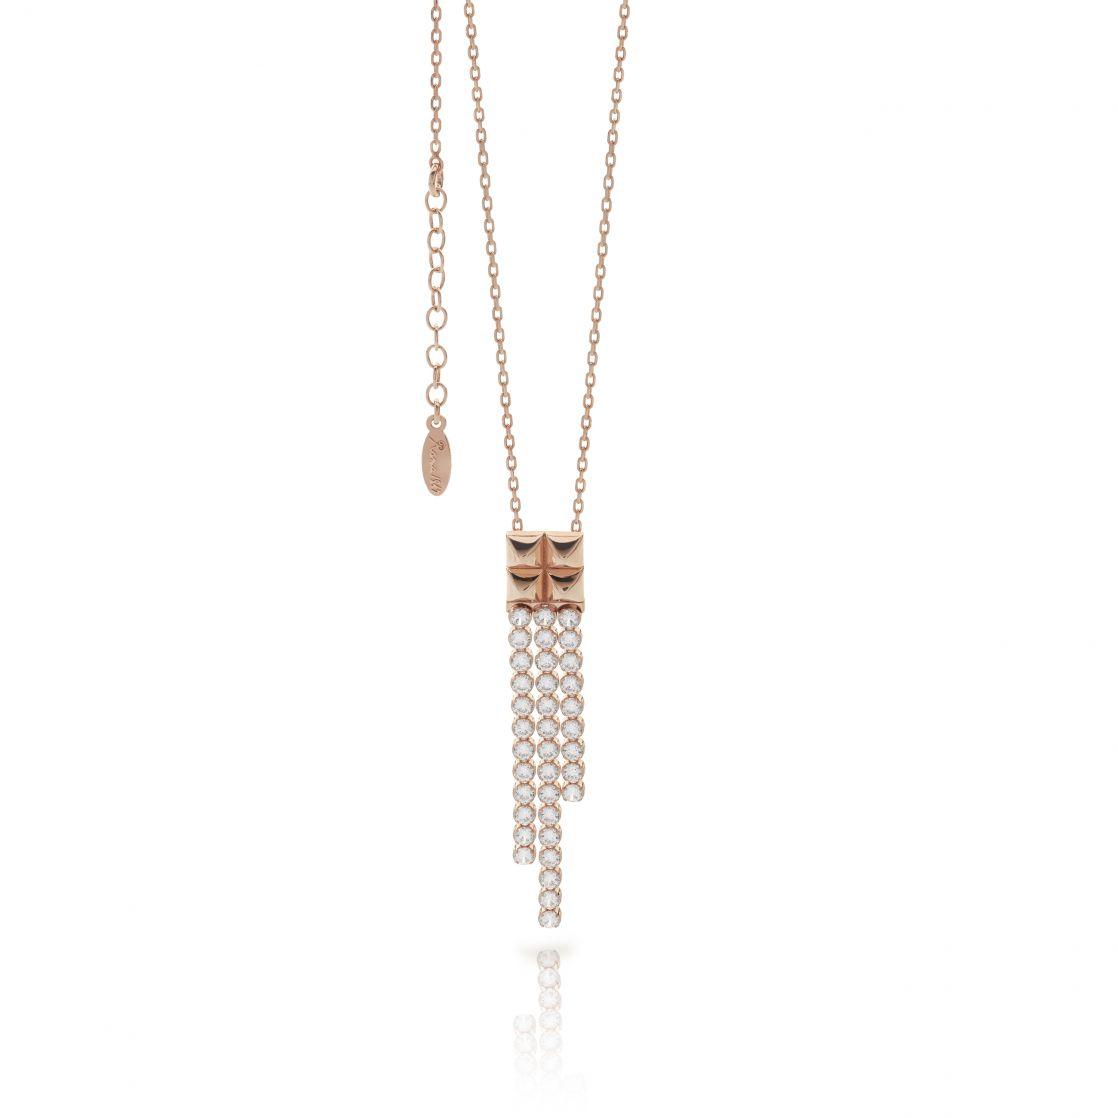 Rock necklace with cz strips